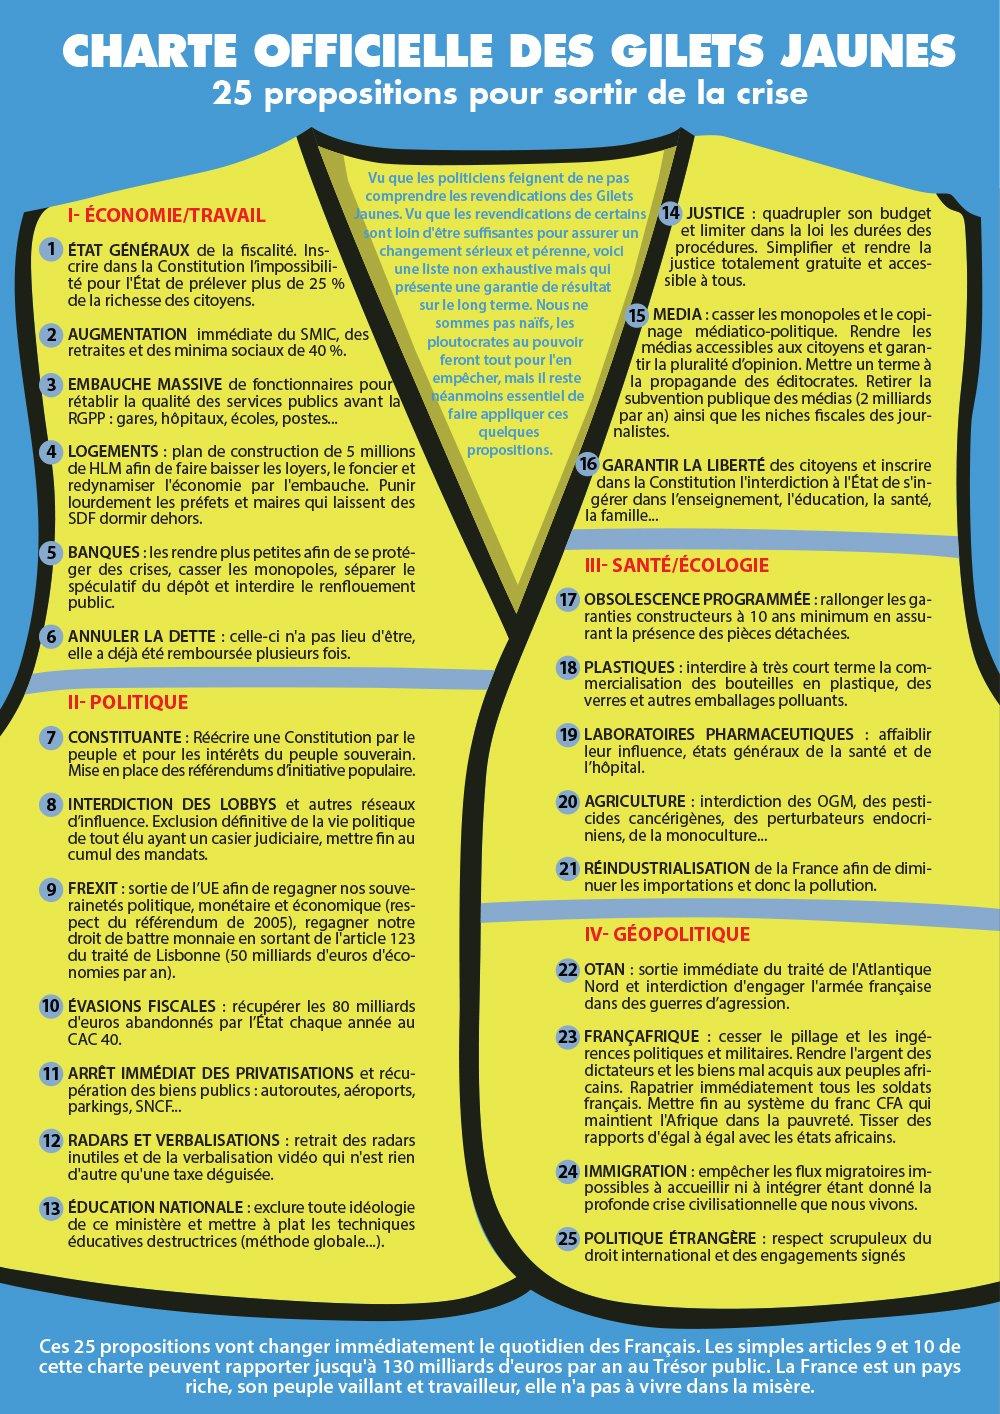 gilet-jaune-charte.jpg?w=1000&ssl=1